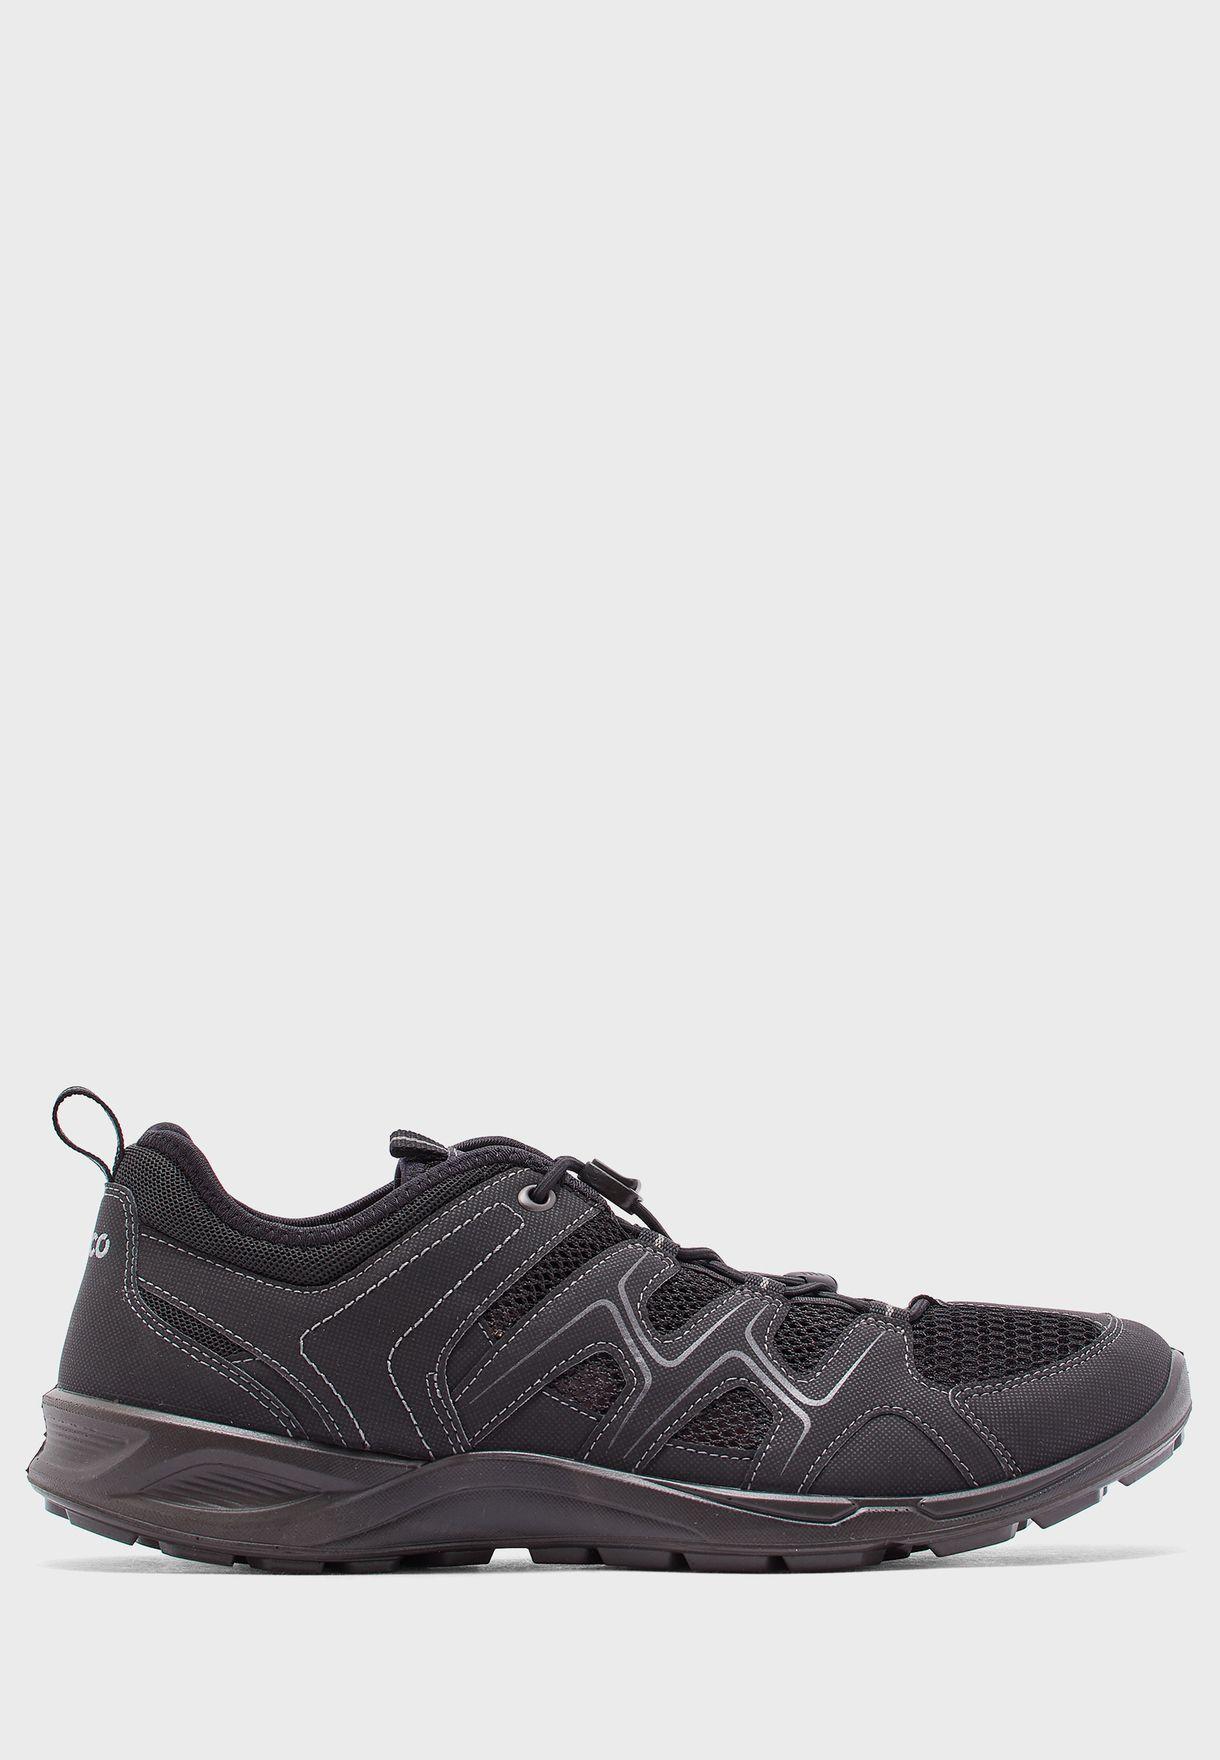 Terracruise Sneakers